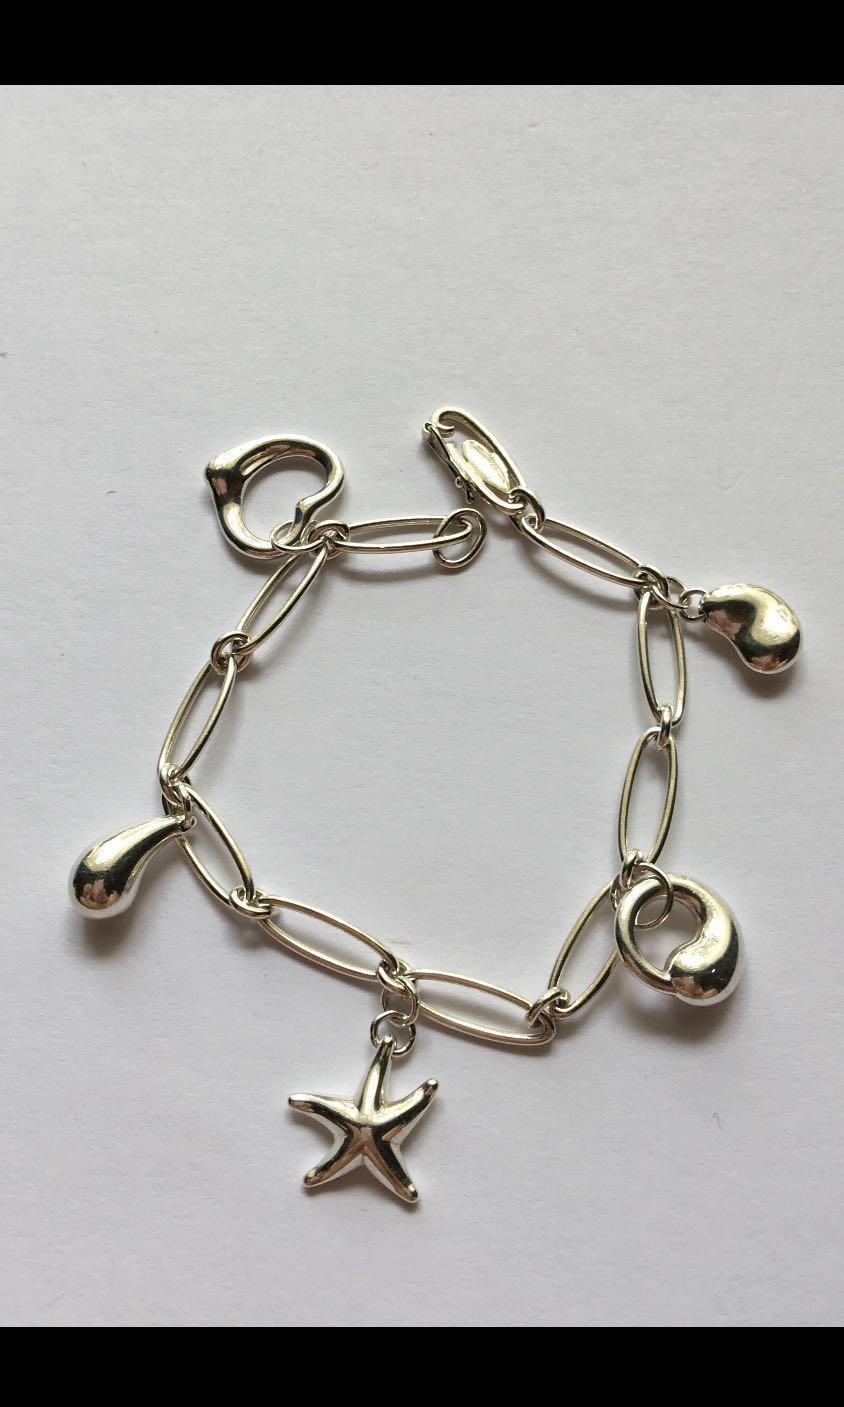 e59e5bc1396f9 Tiffany & Co Bracelet